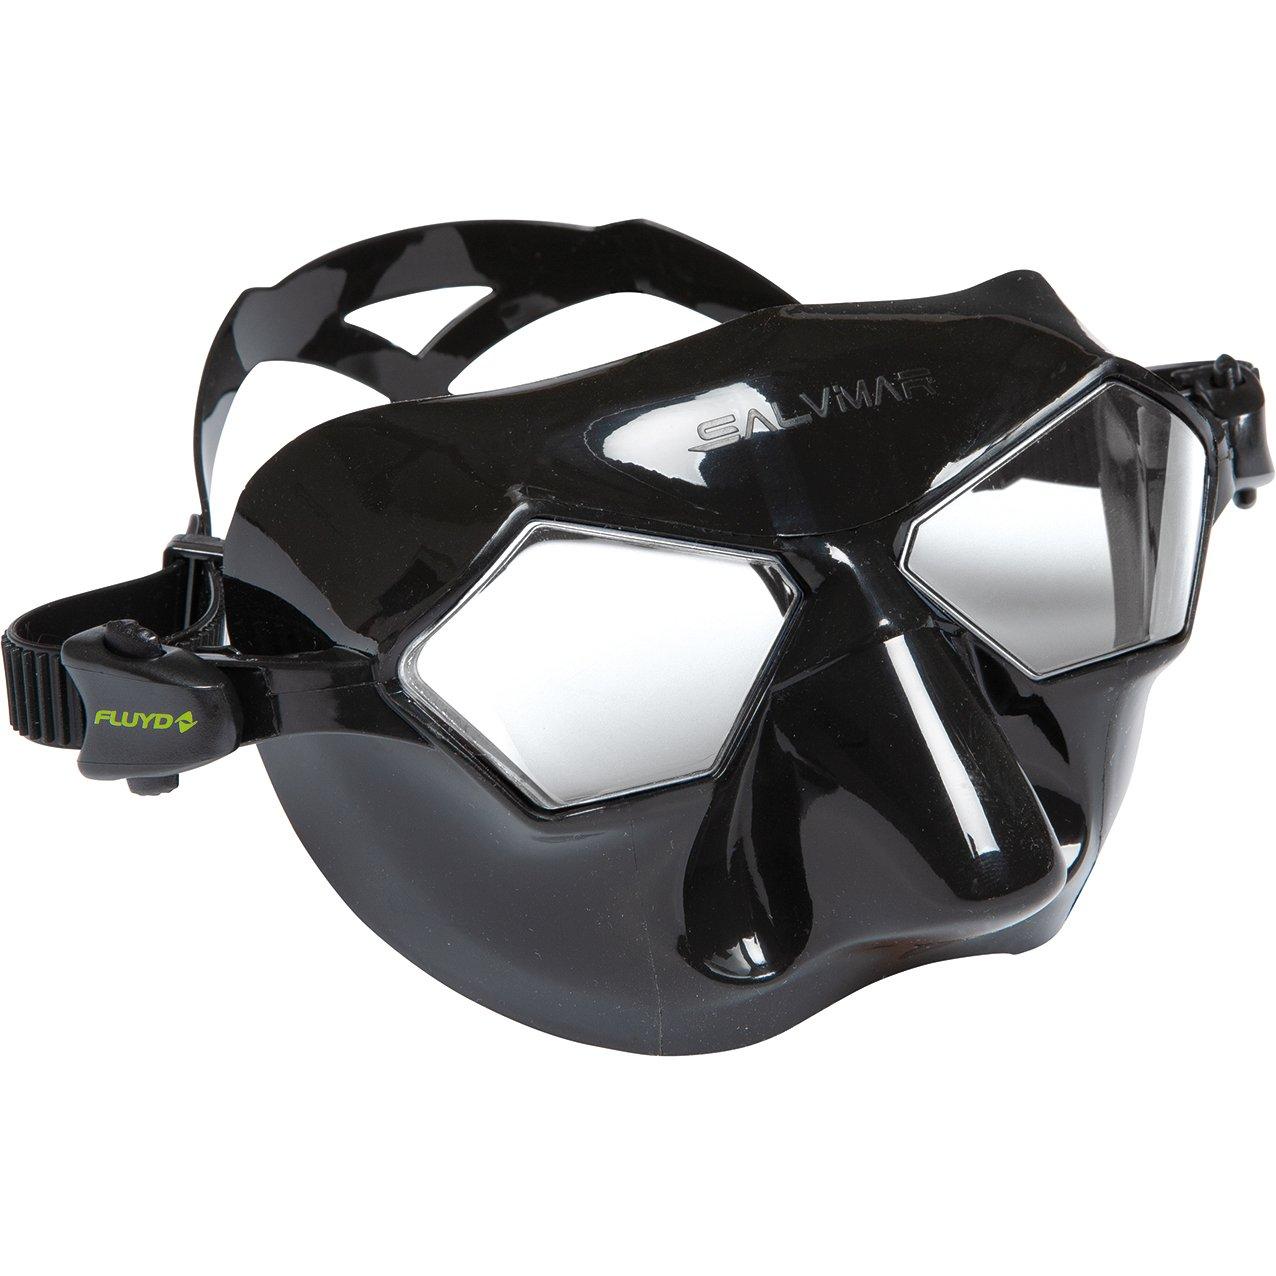 Salvimar Fluyd Incredible Mask